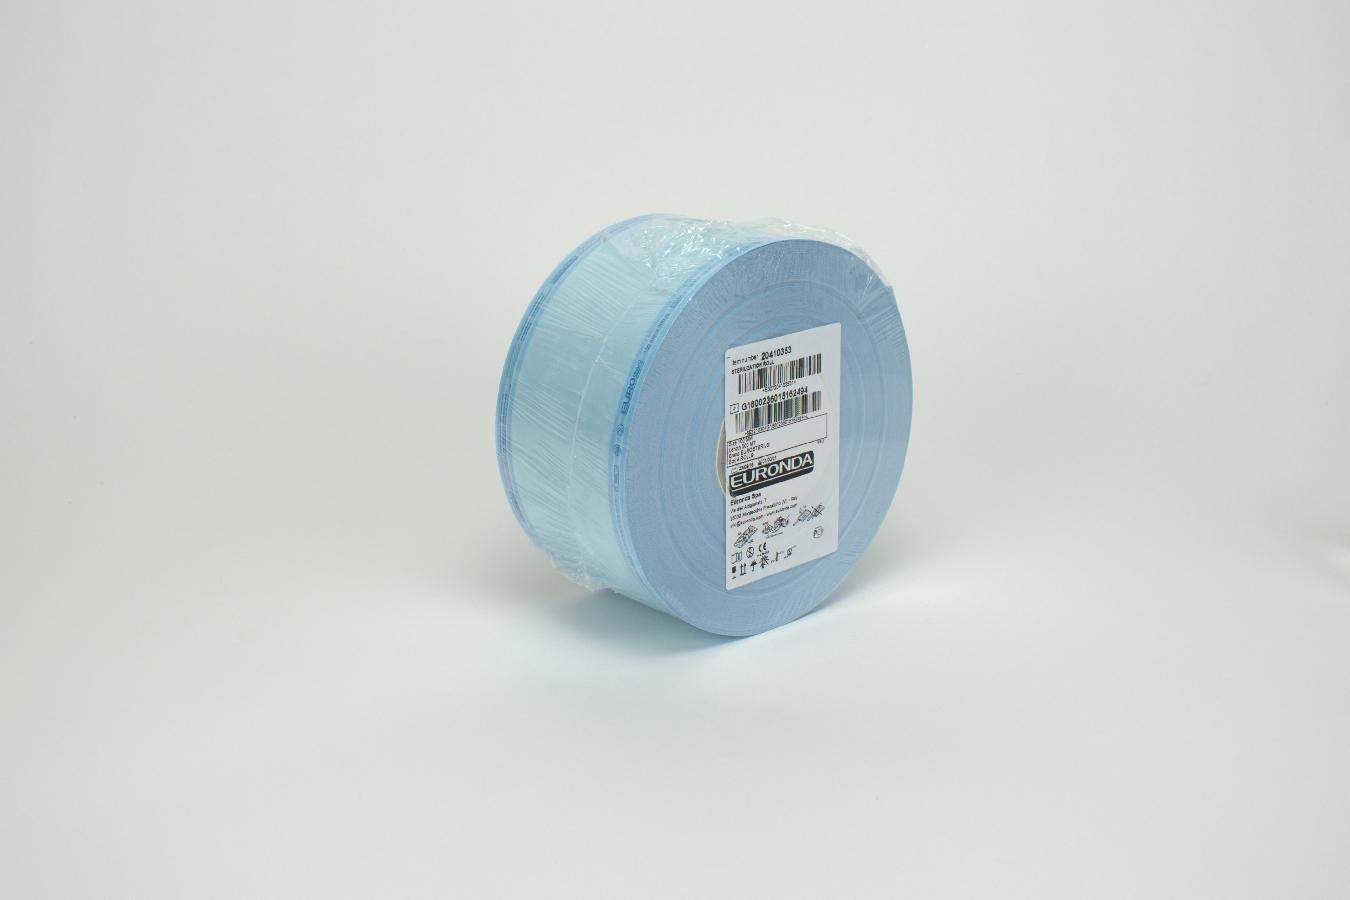 Sterilisationsfolie 10cm/200m Rl